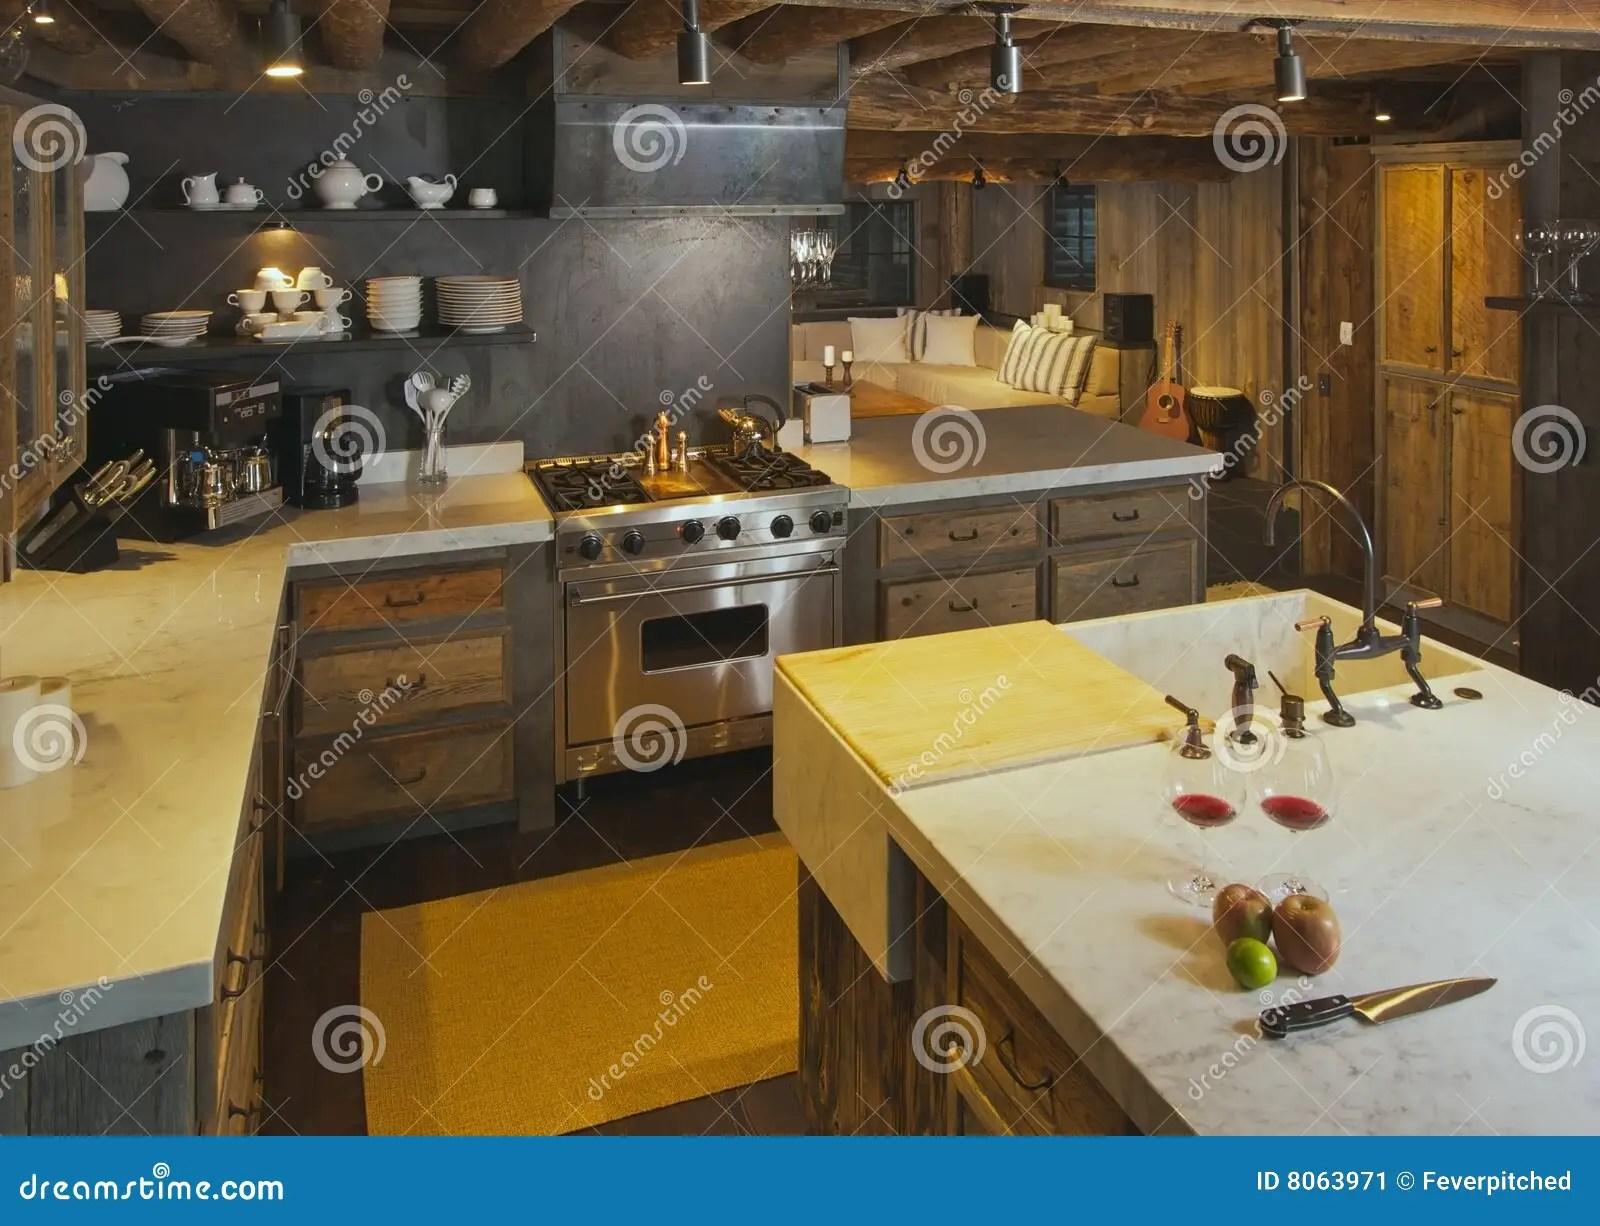 in stock kitchens kitchen banquette seating 现代客舱的厨房库存图片 图片包括有烹调 实际 灌肠器 厨师 宽敞 客舱充分地被装备的厨房日志豪华土气